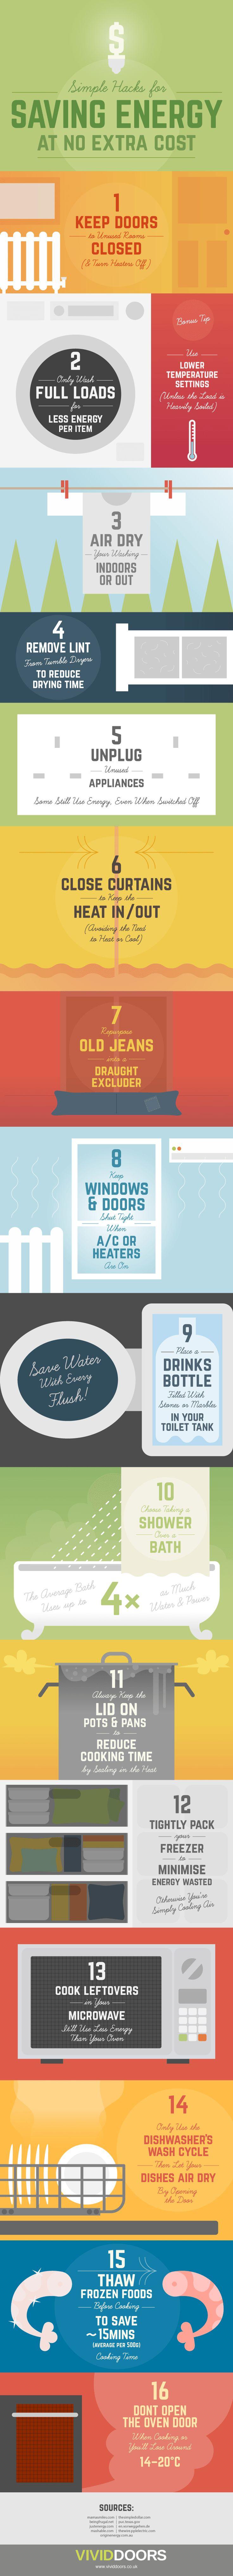 Average Electricity Bill For 1 Bedroom Apartment Custom Inspiration Design